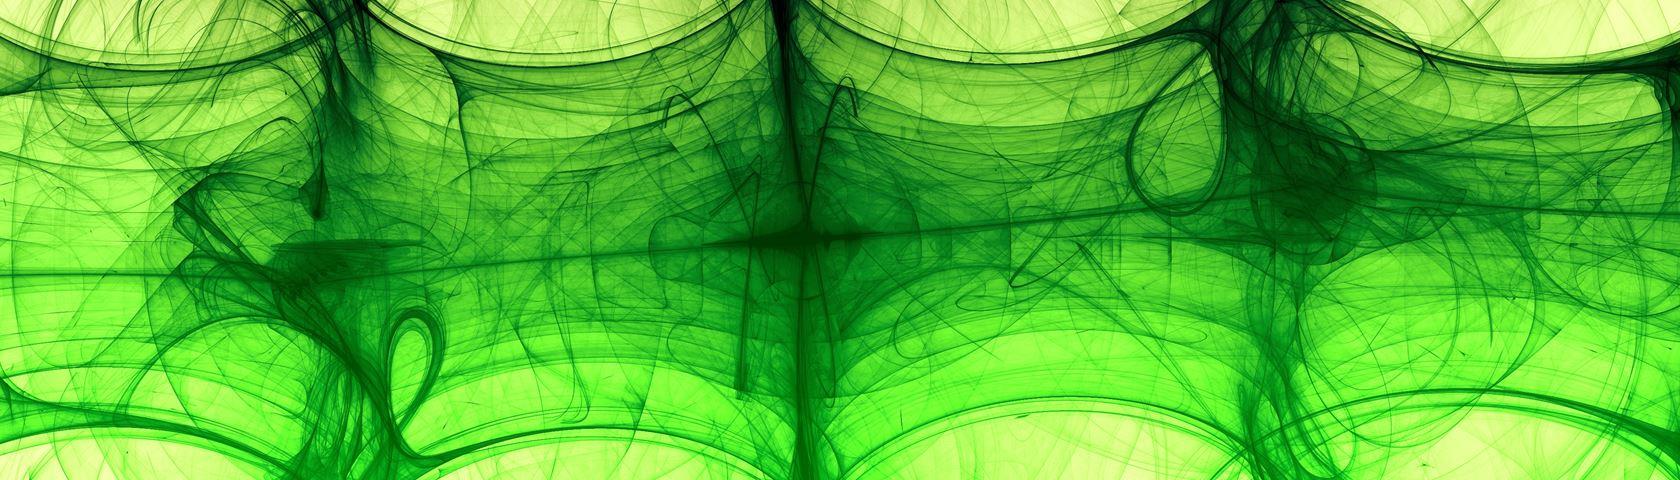 Bamboo Reed X-Ray